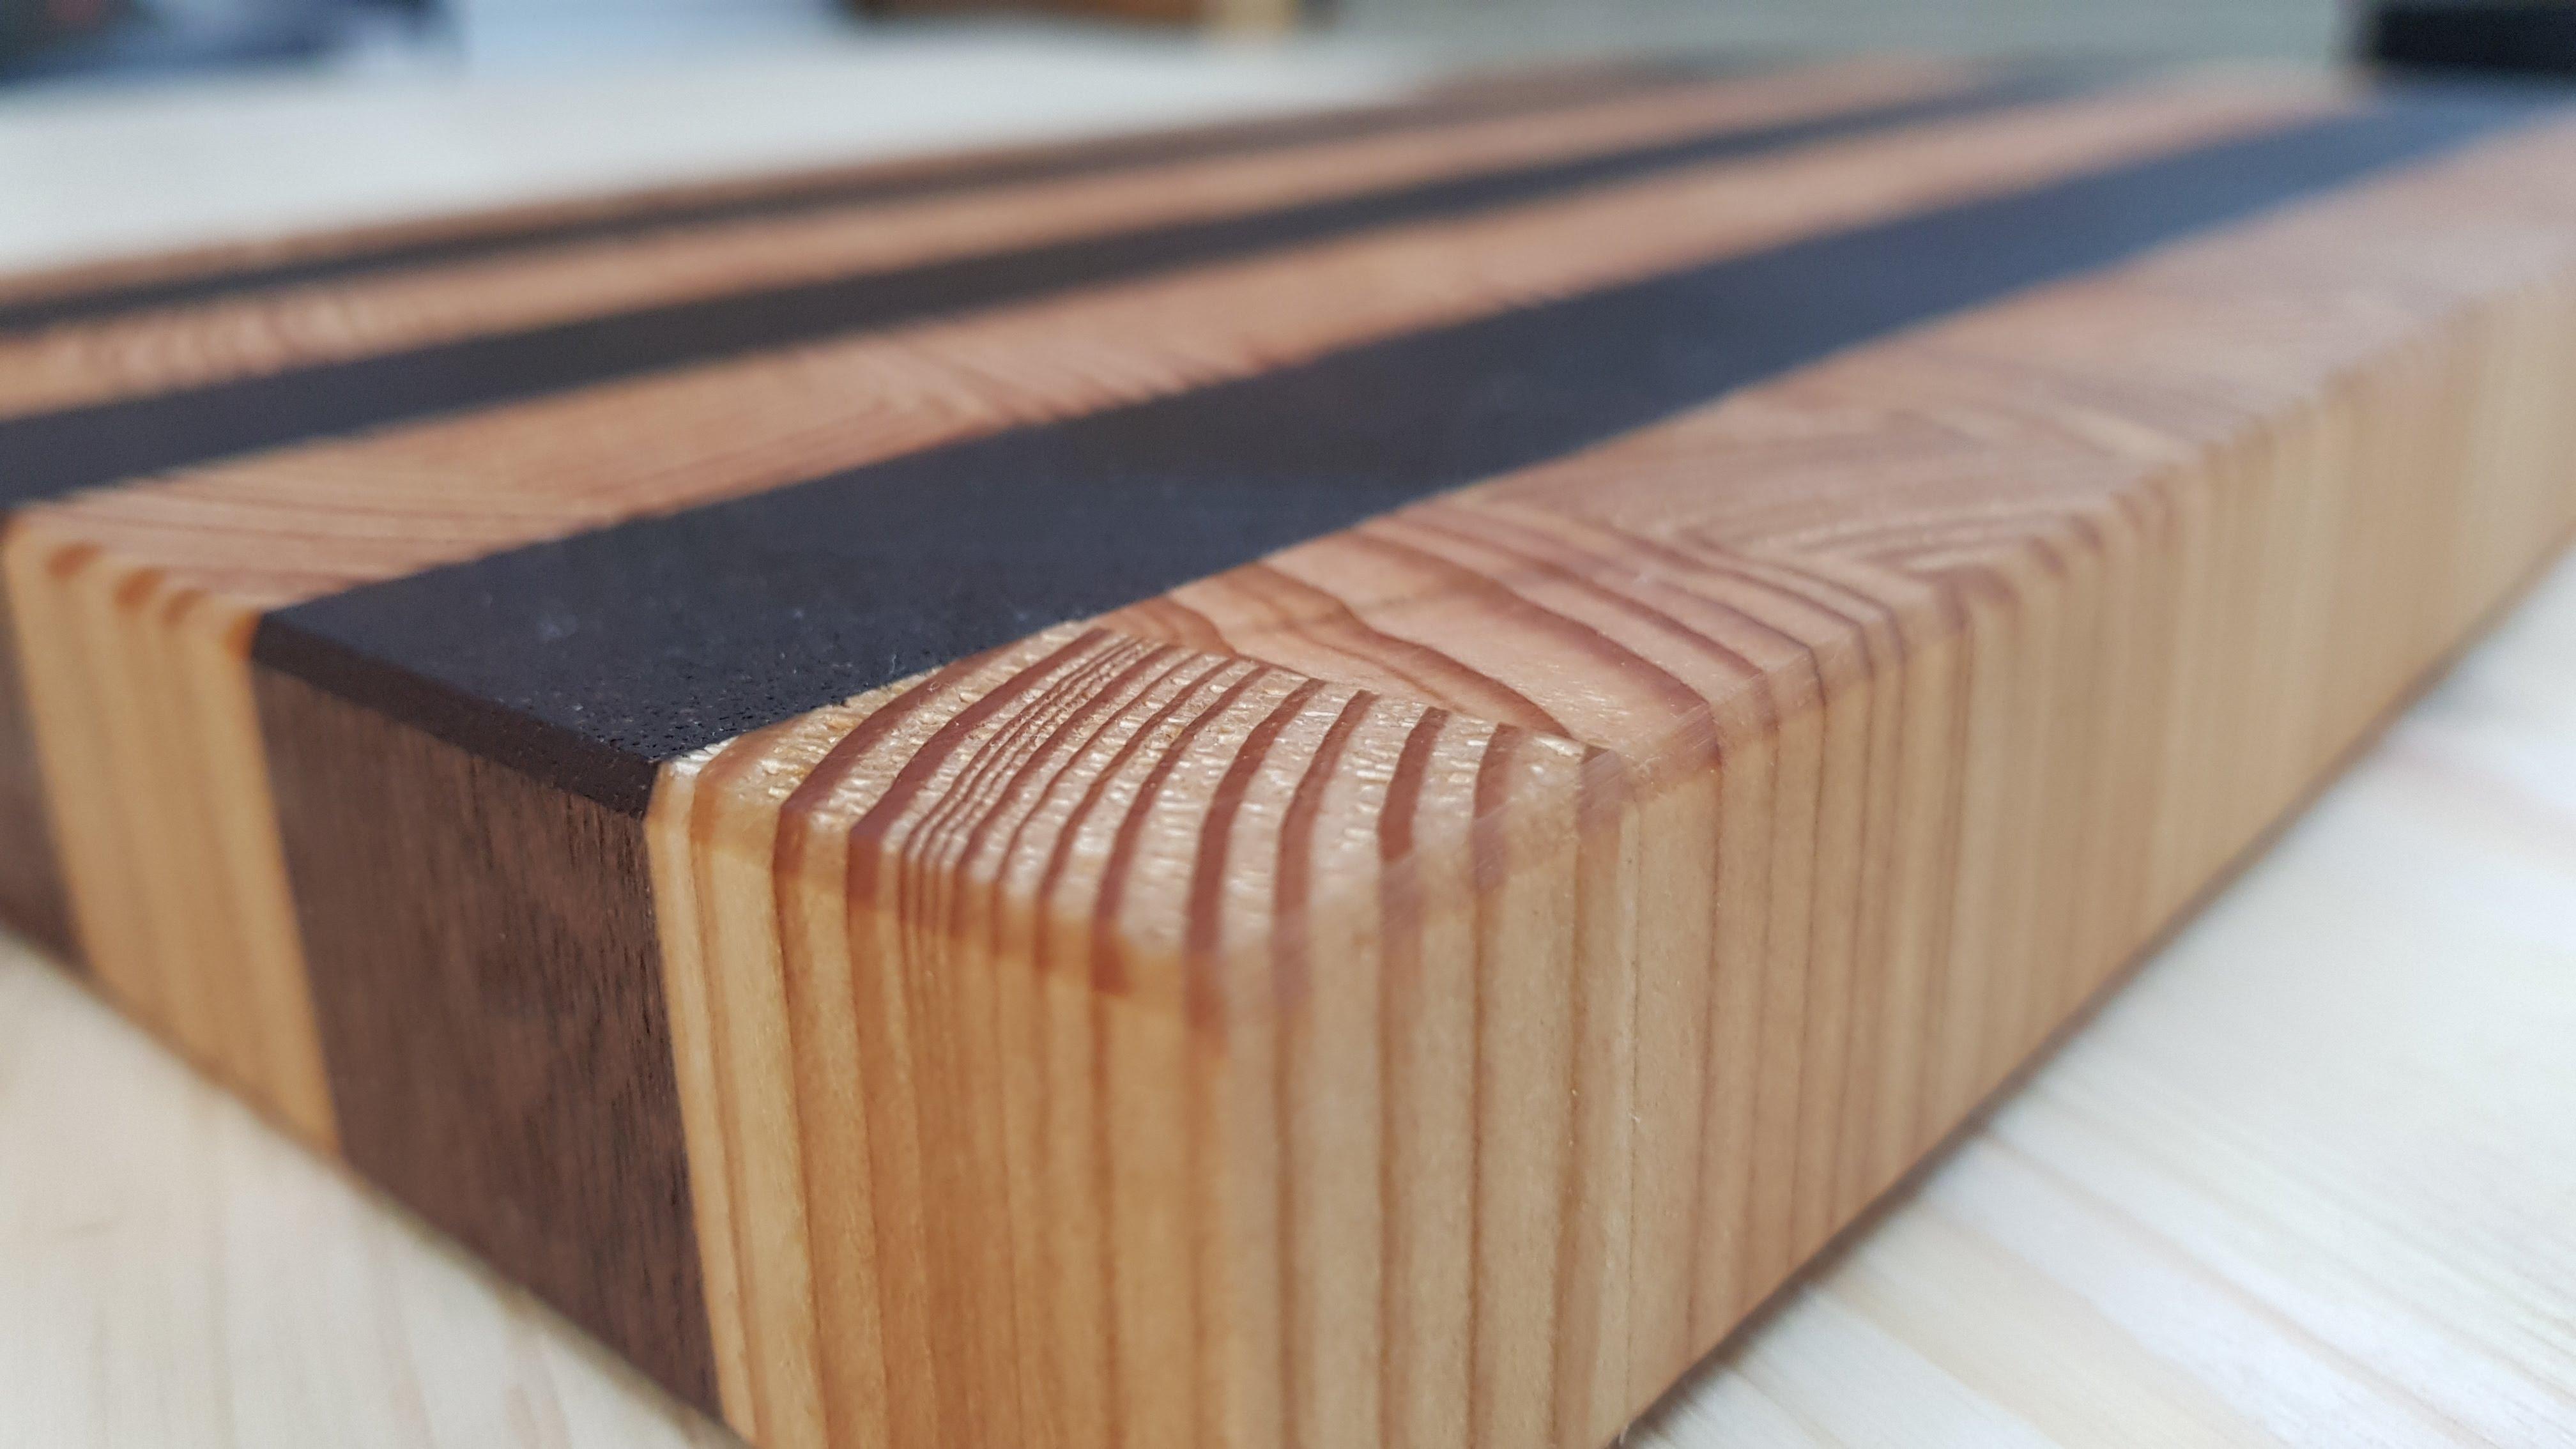 cuttingboard selber bauen der kellerwerker. Black Bedroom Furniture Sets. Home Design Ideas